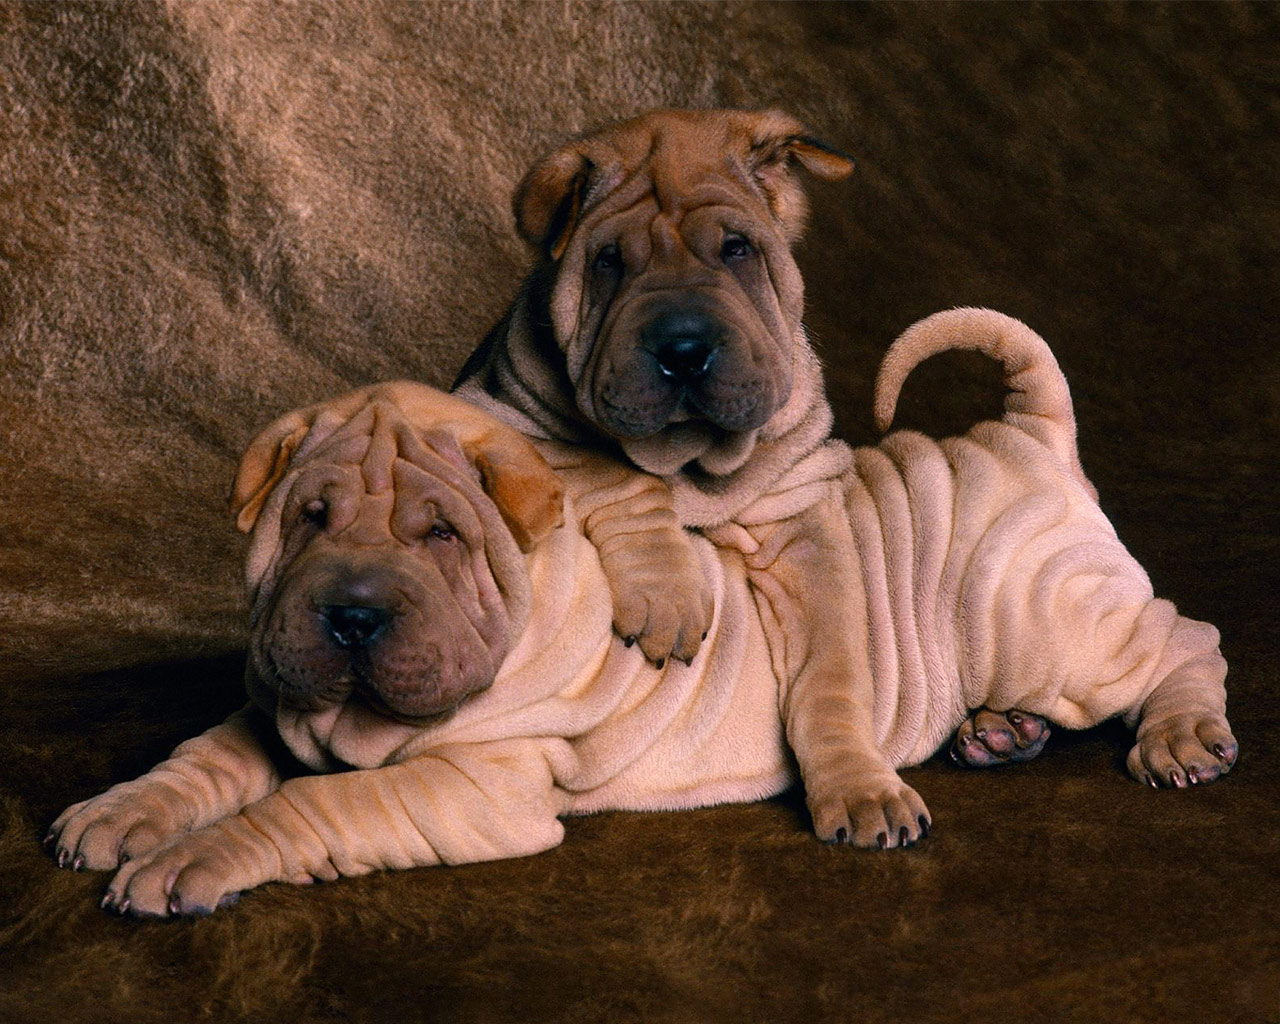 Shar Pei Puppies: Shar Img Shar Pei Puppies Breed